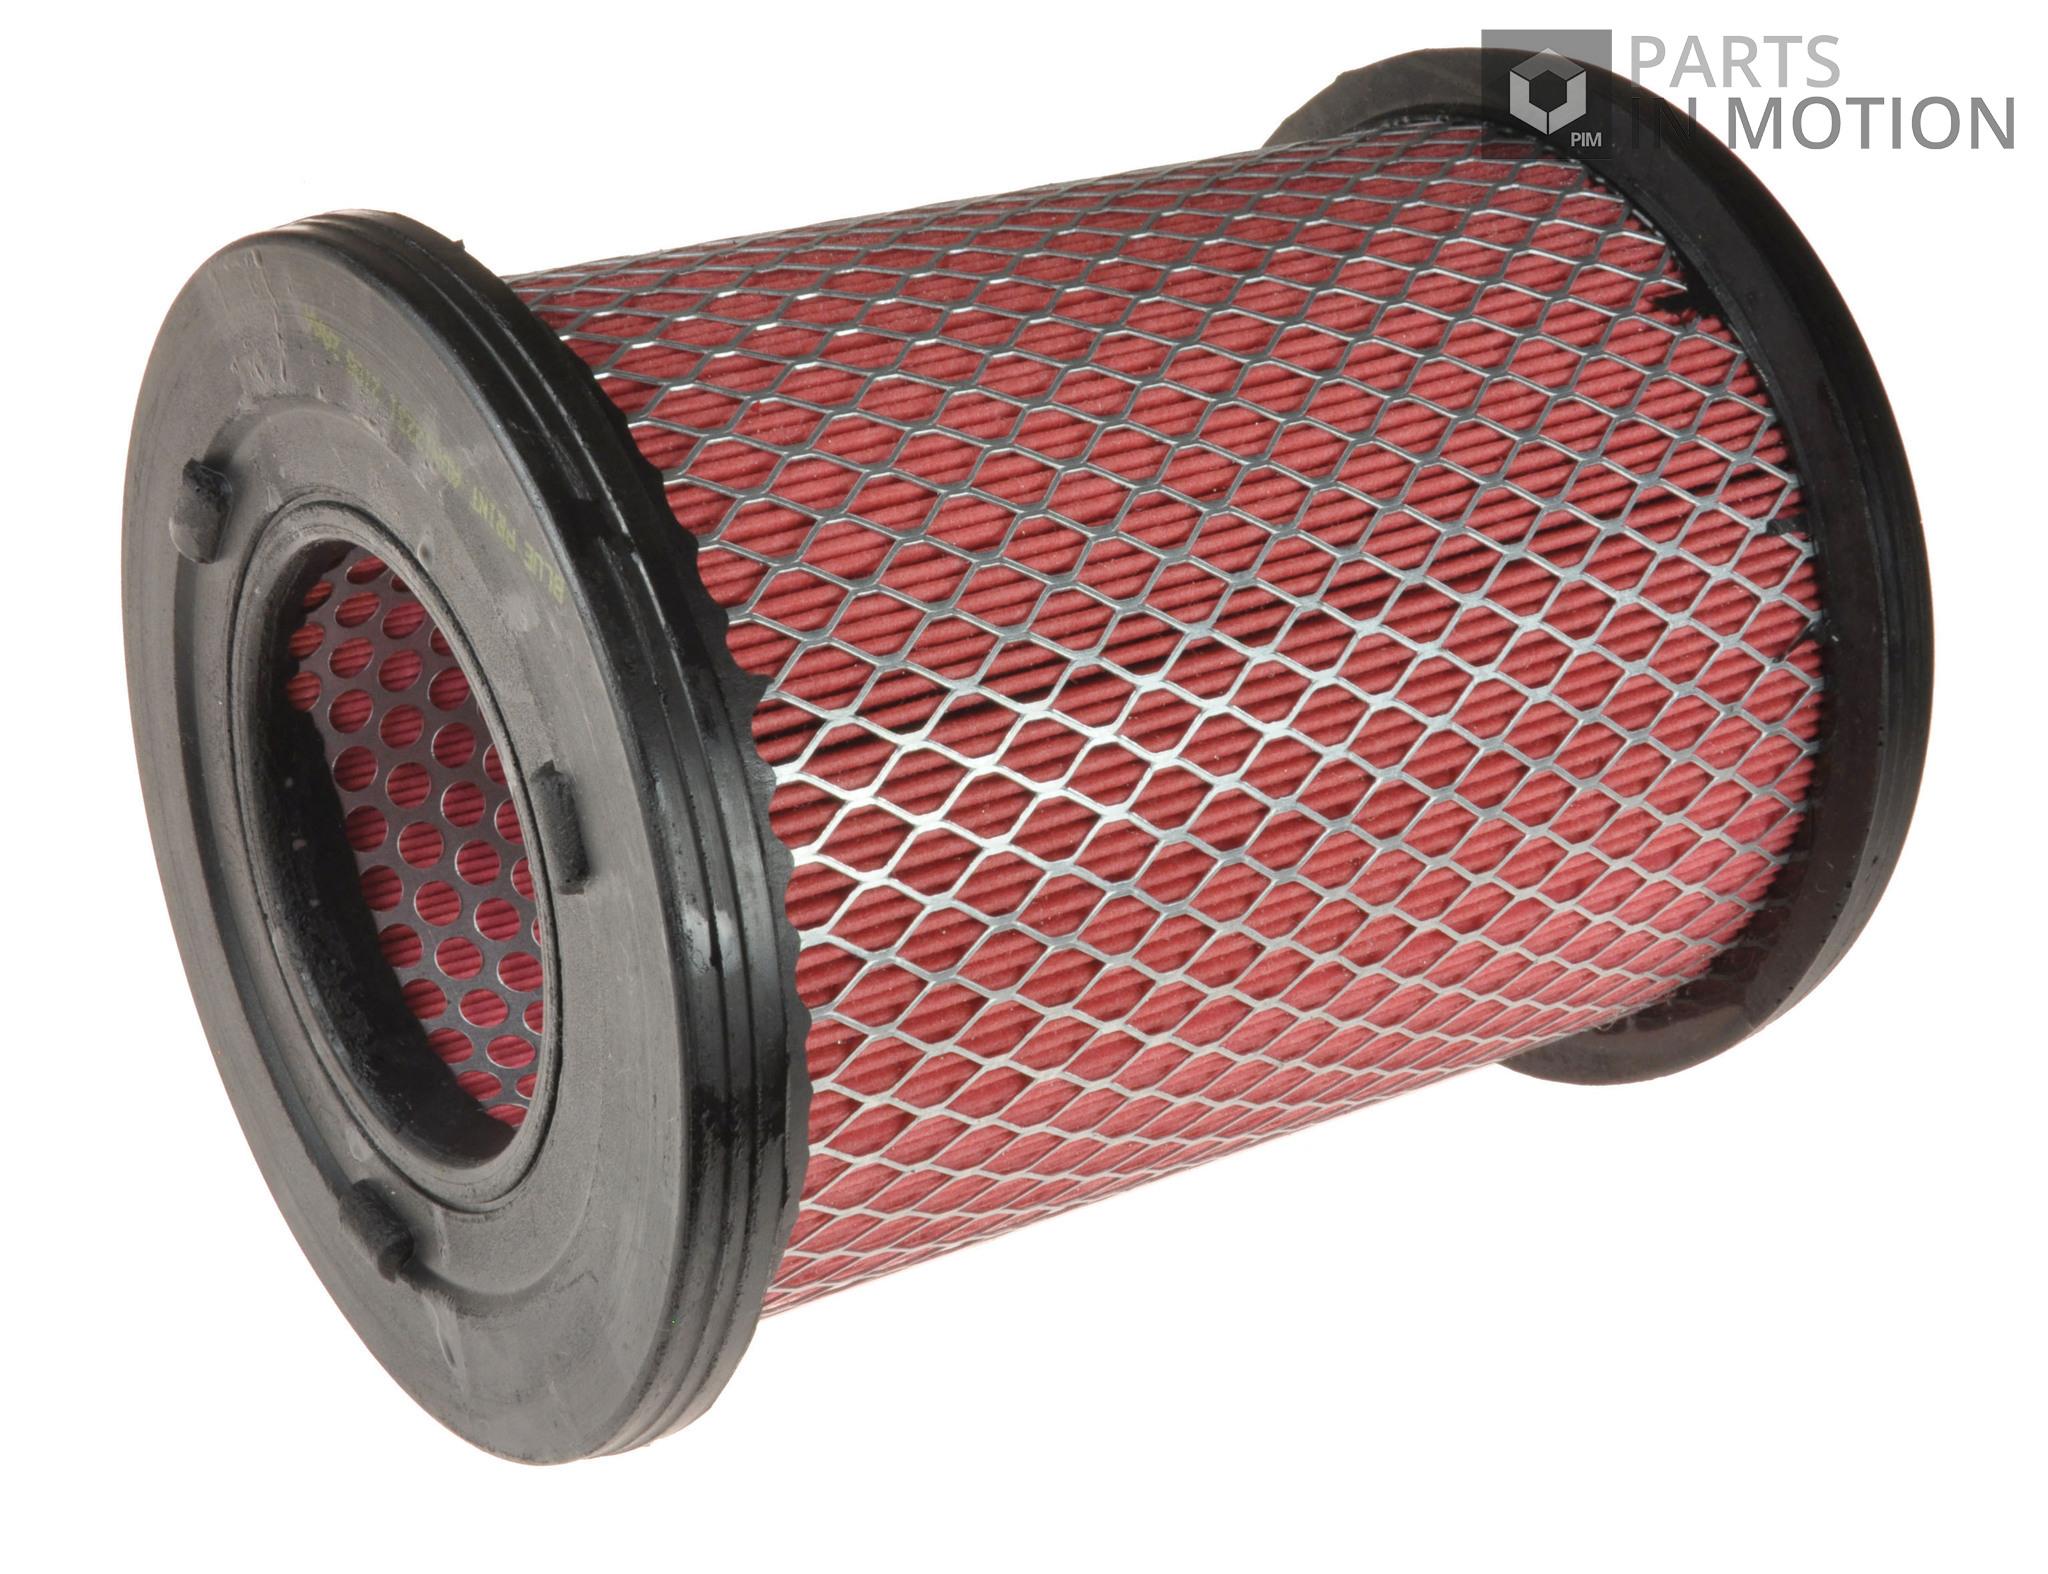 Fits Nissan Navara D22 2.5 TD 4WD Fram Engine Oil Filter Service Replacement